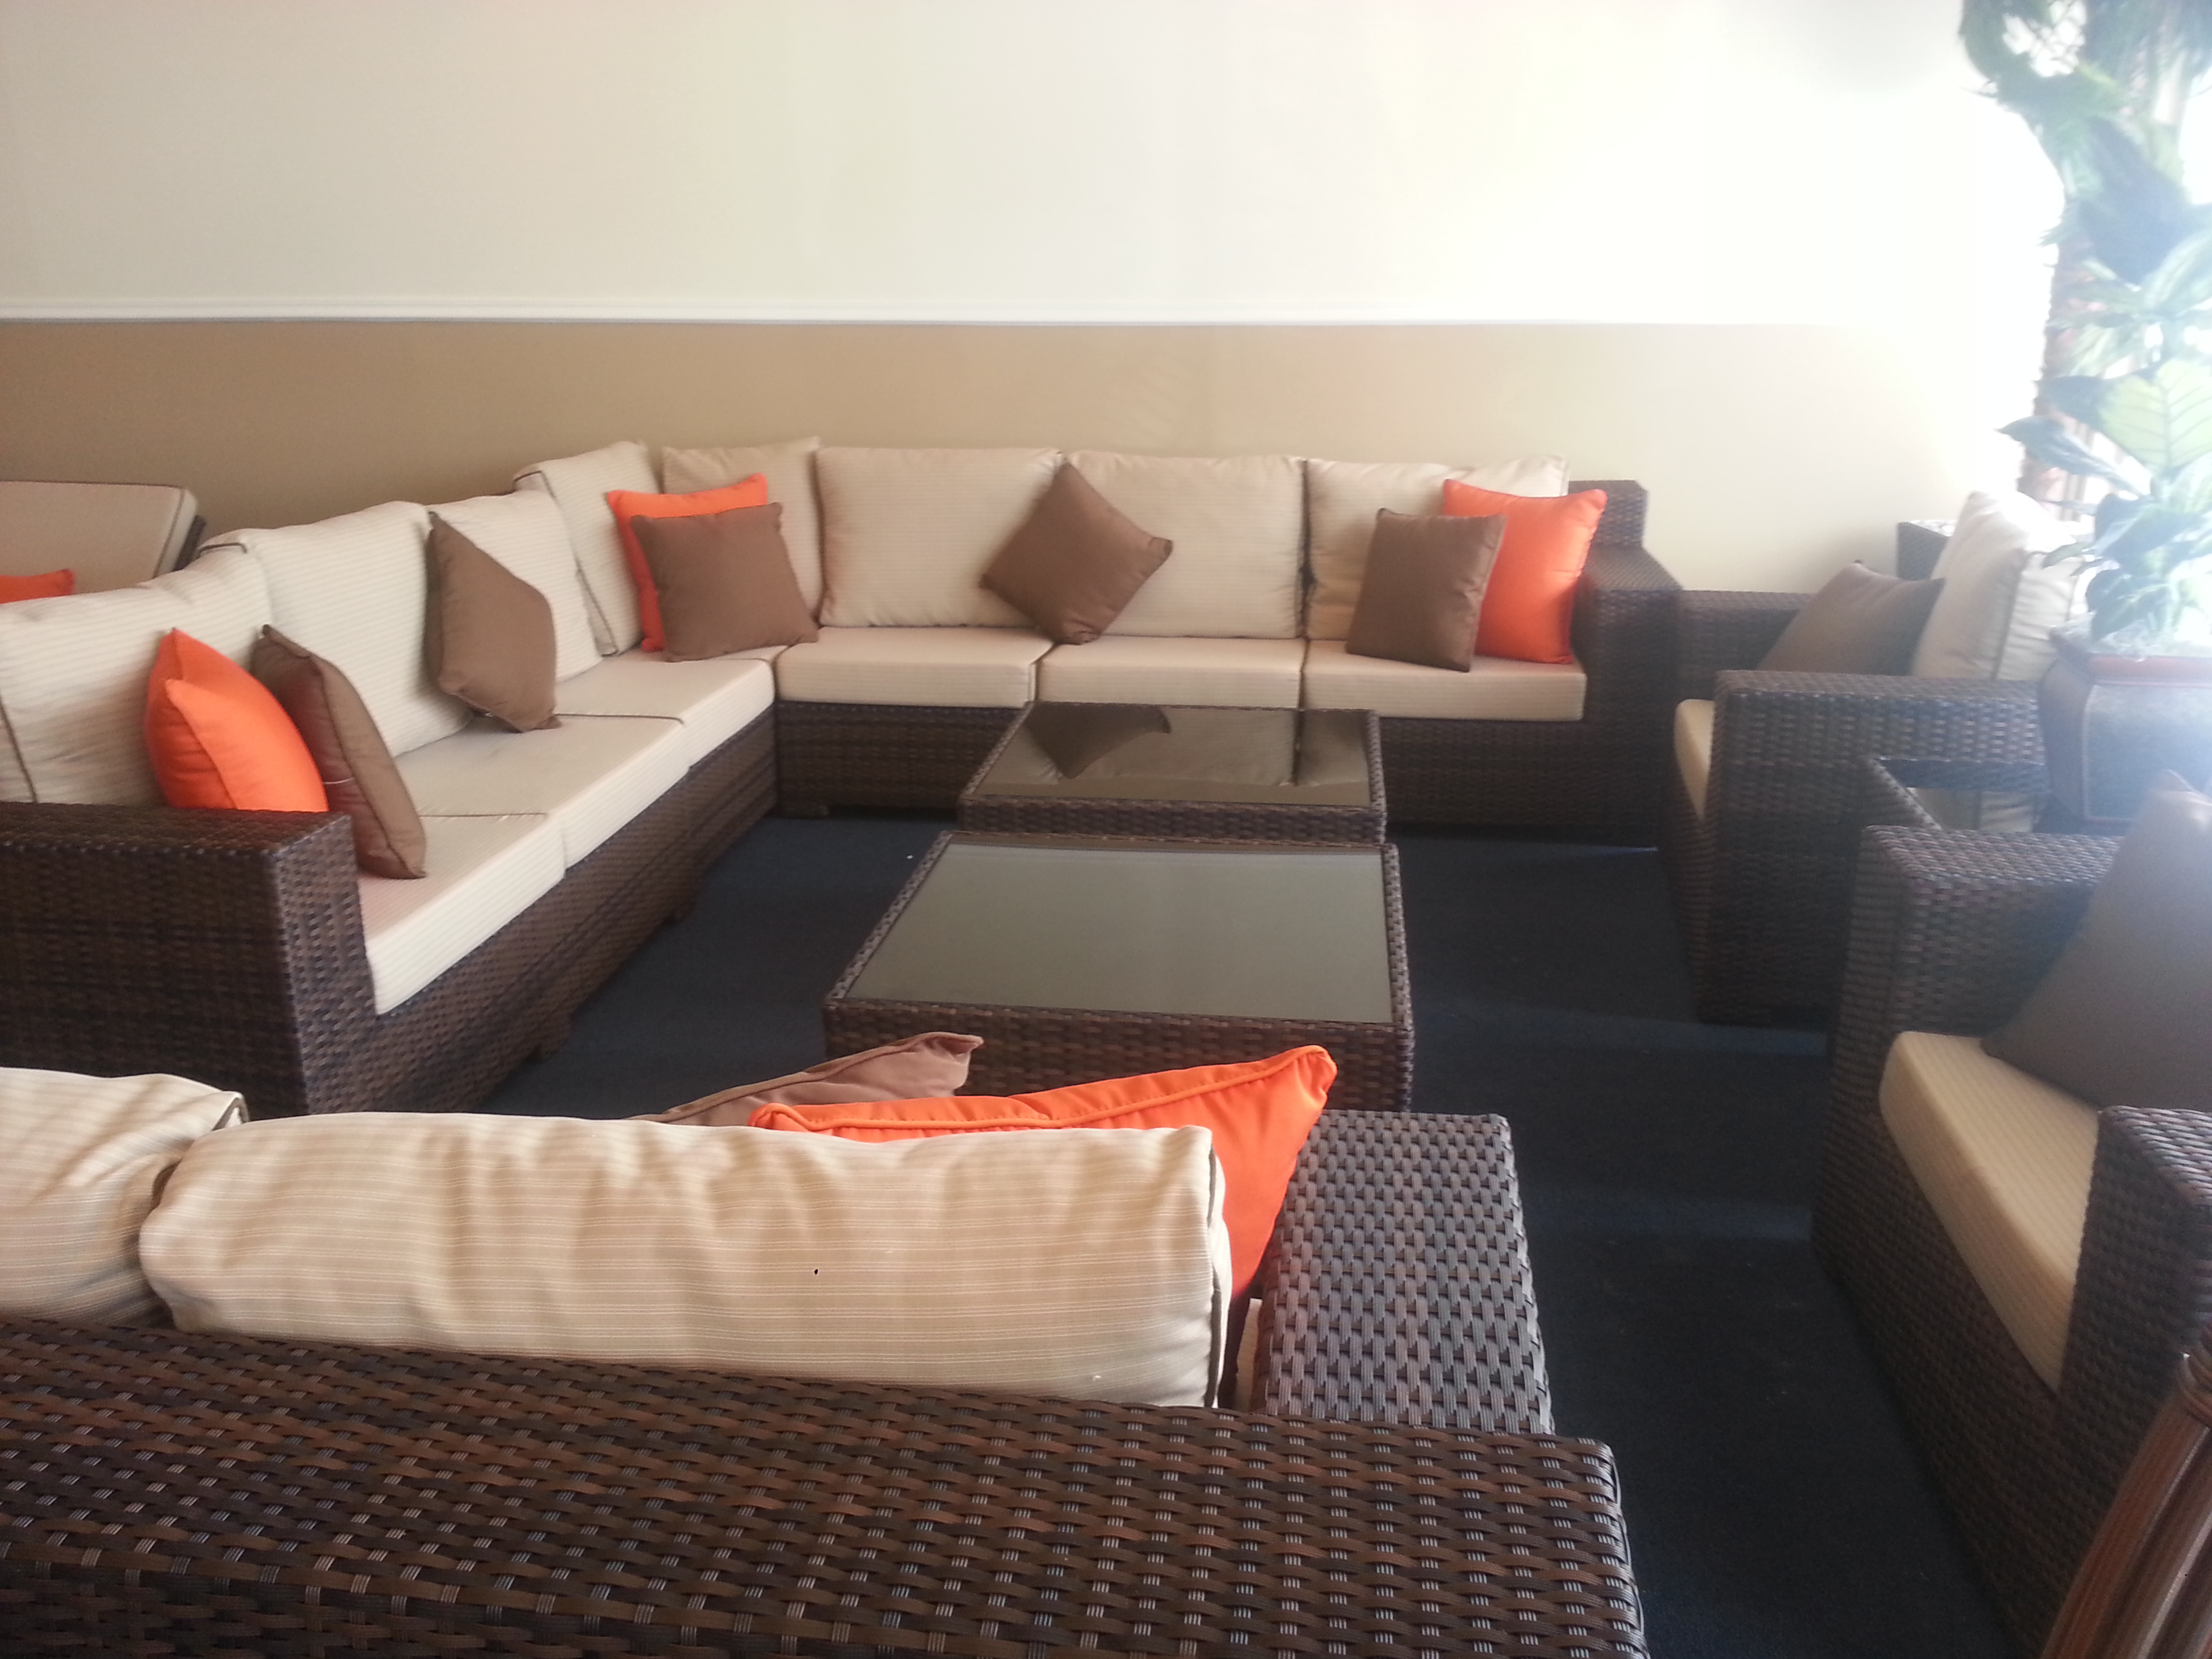 Best Patio Furniture - Outdoor Patio Emporium Corp 311 W 21st St ...